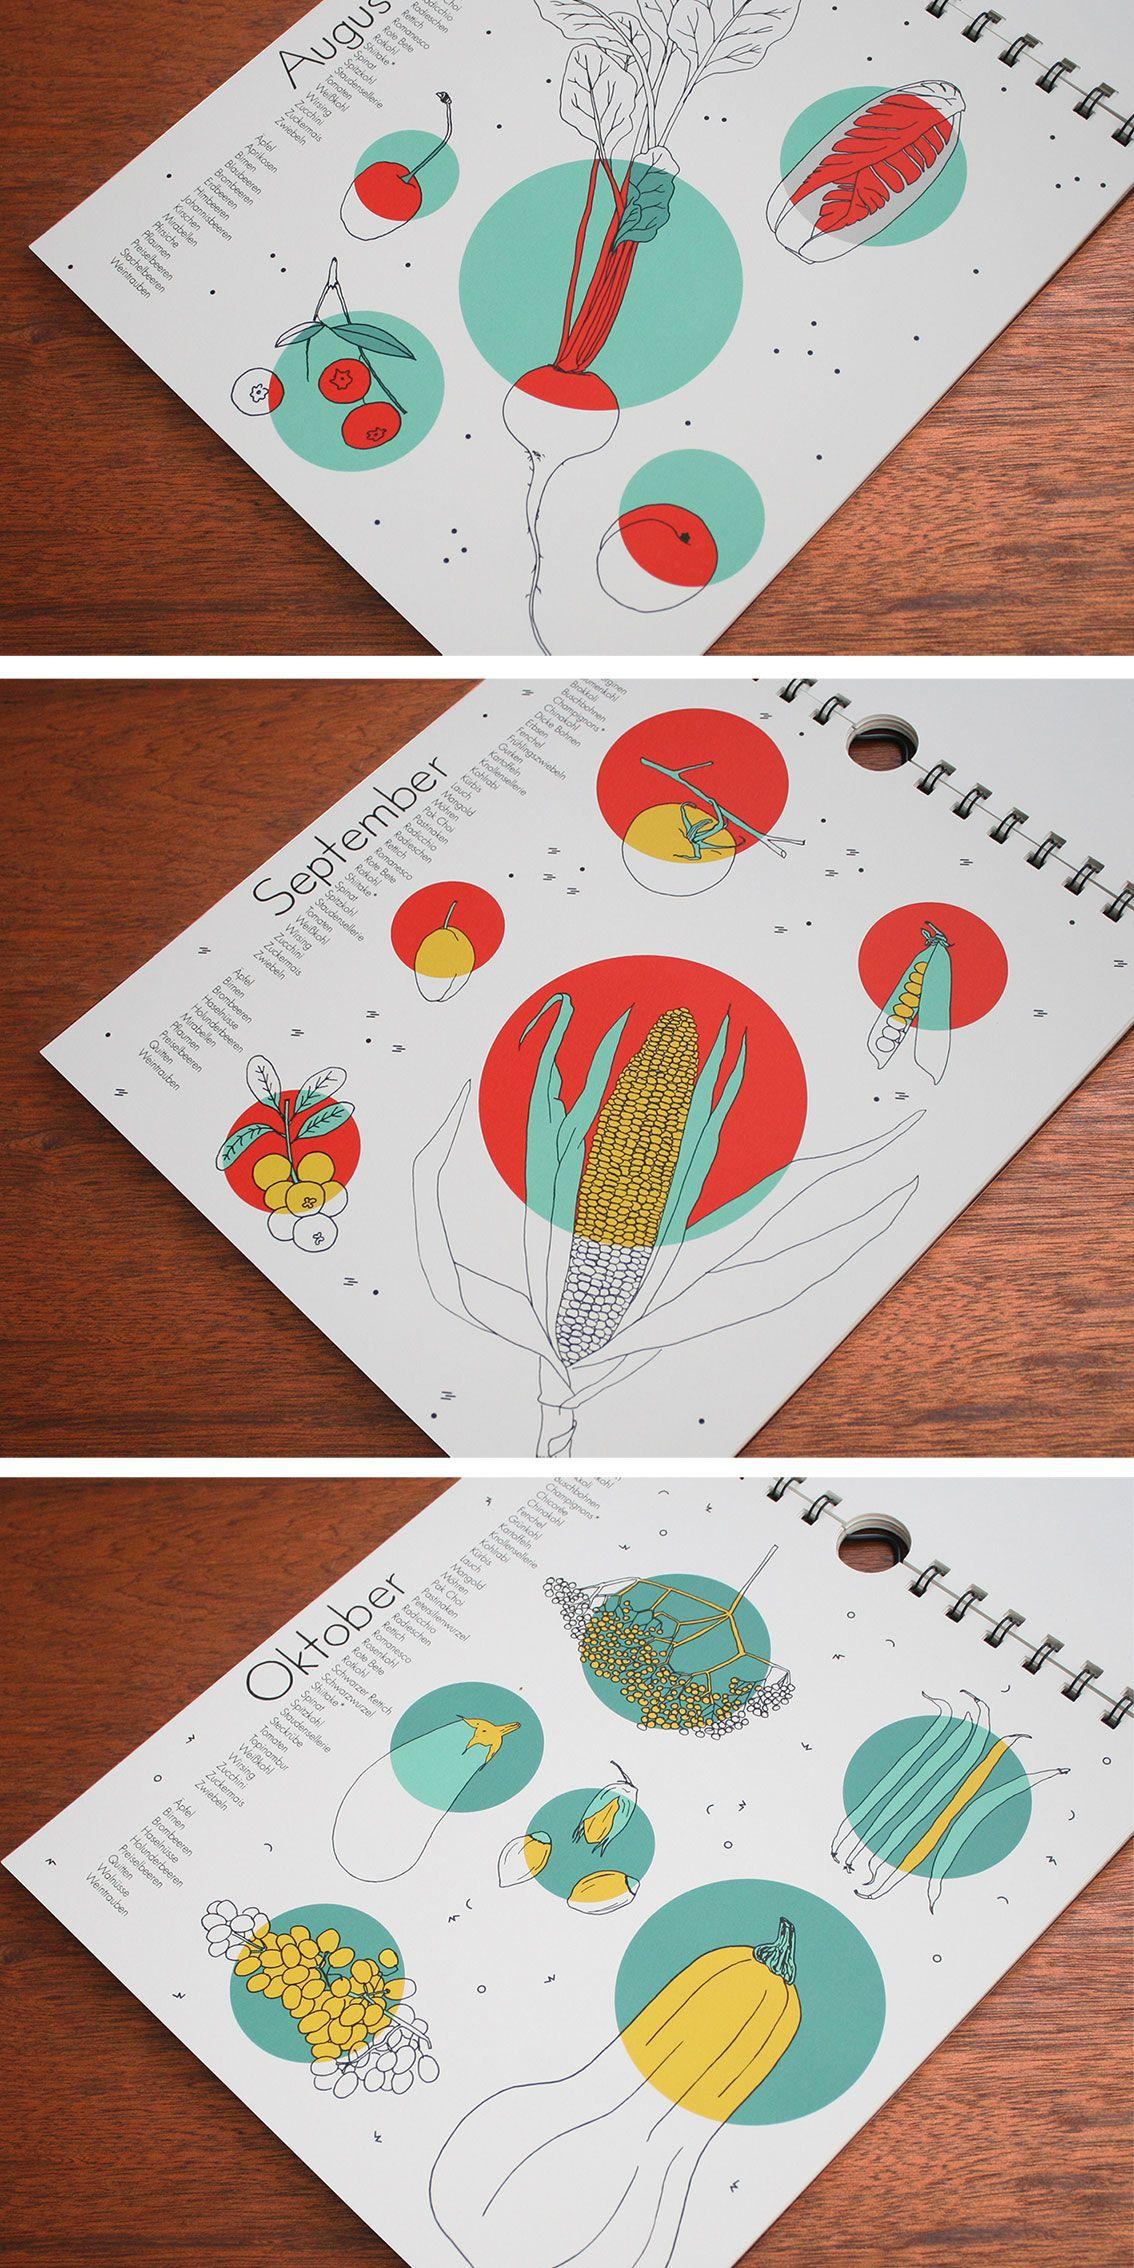 saisonkalender polypodium graphic design design genius pinterest grafik design. Black Bedroom Furniture Sets. Home Design Ideas